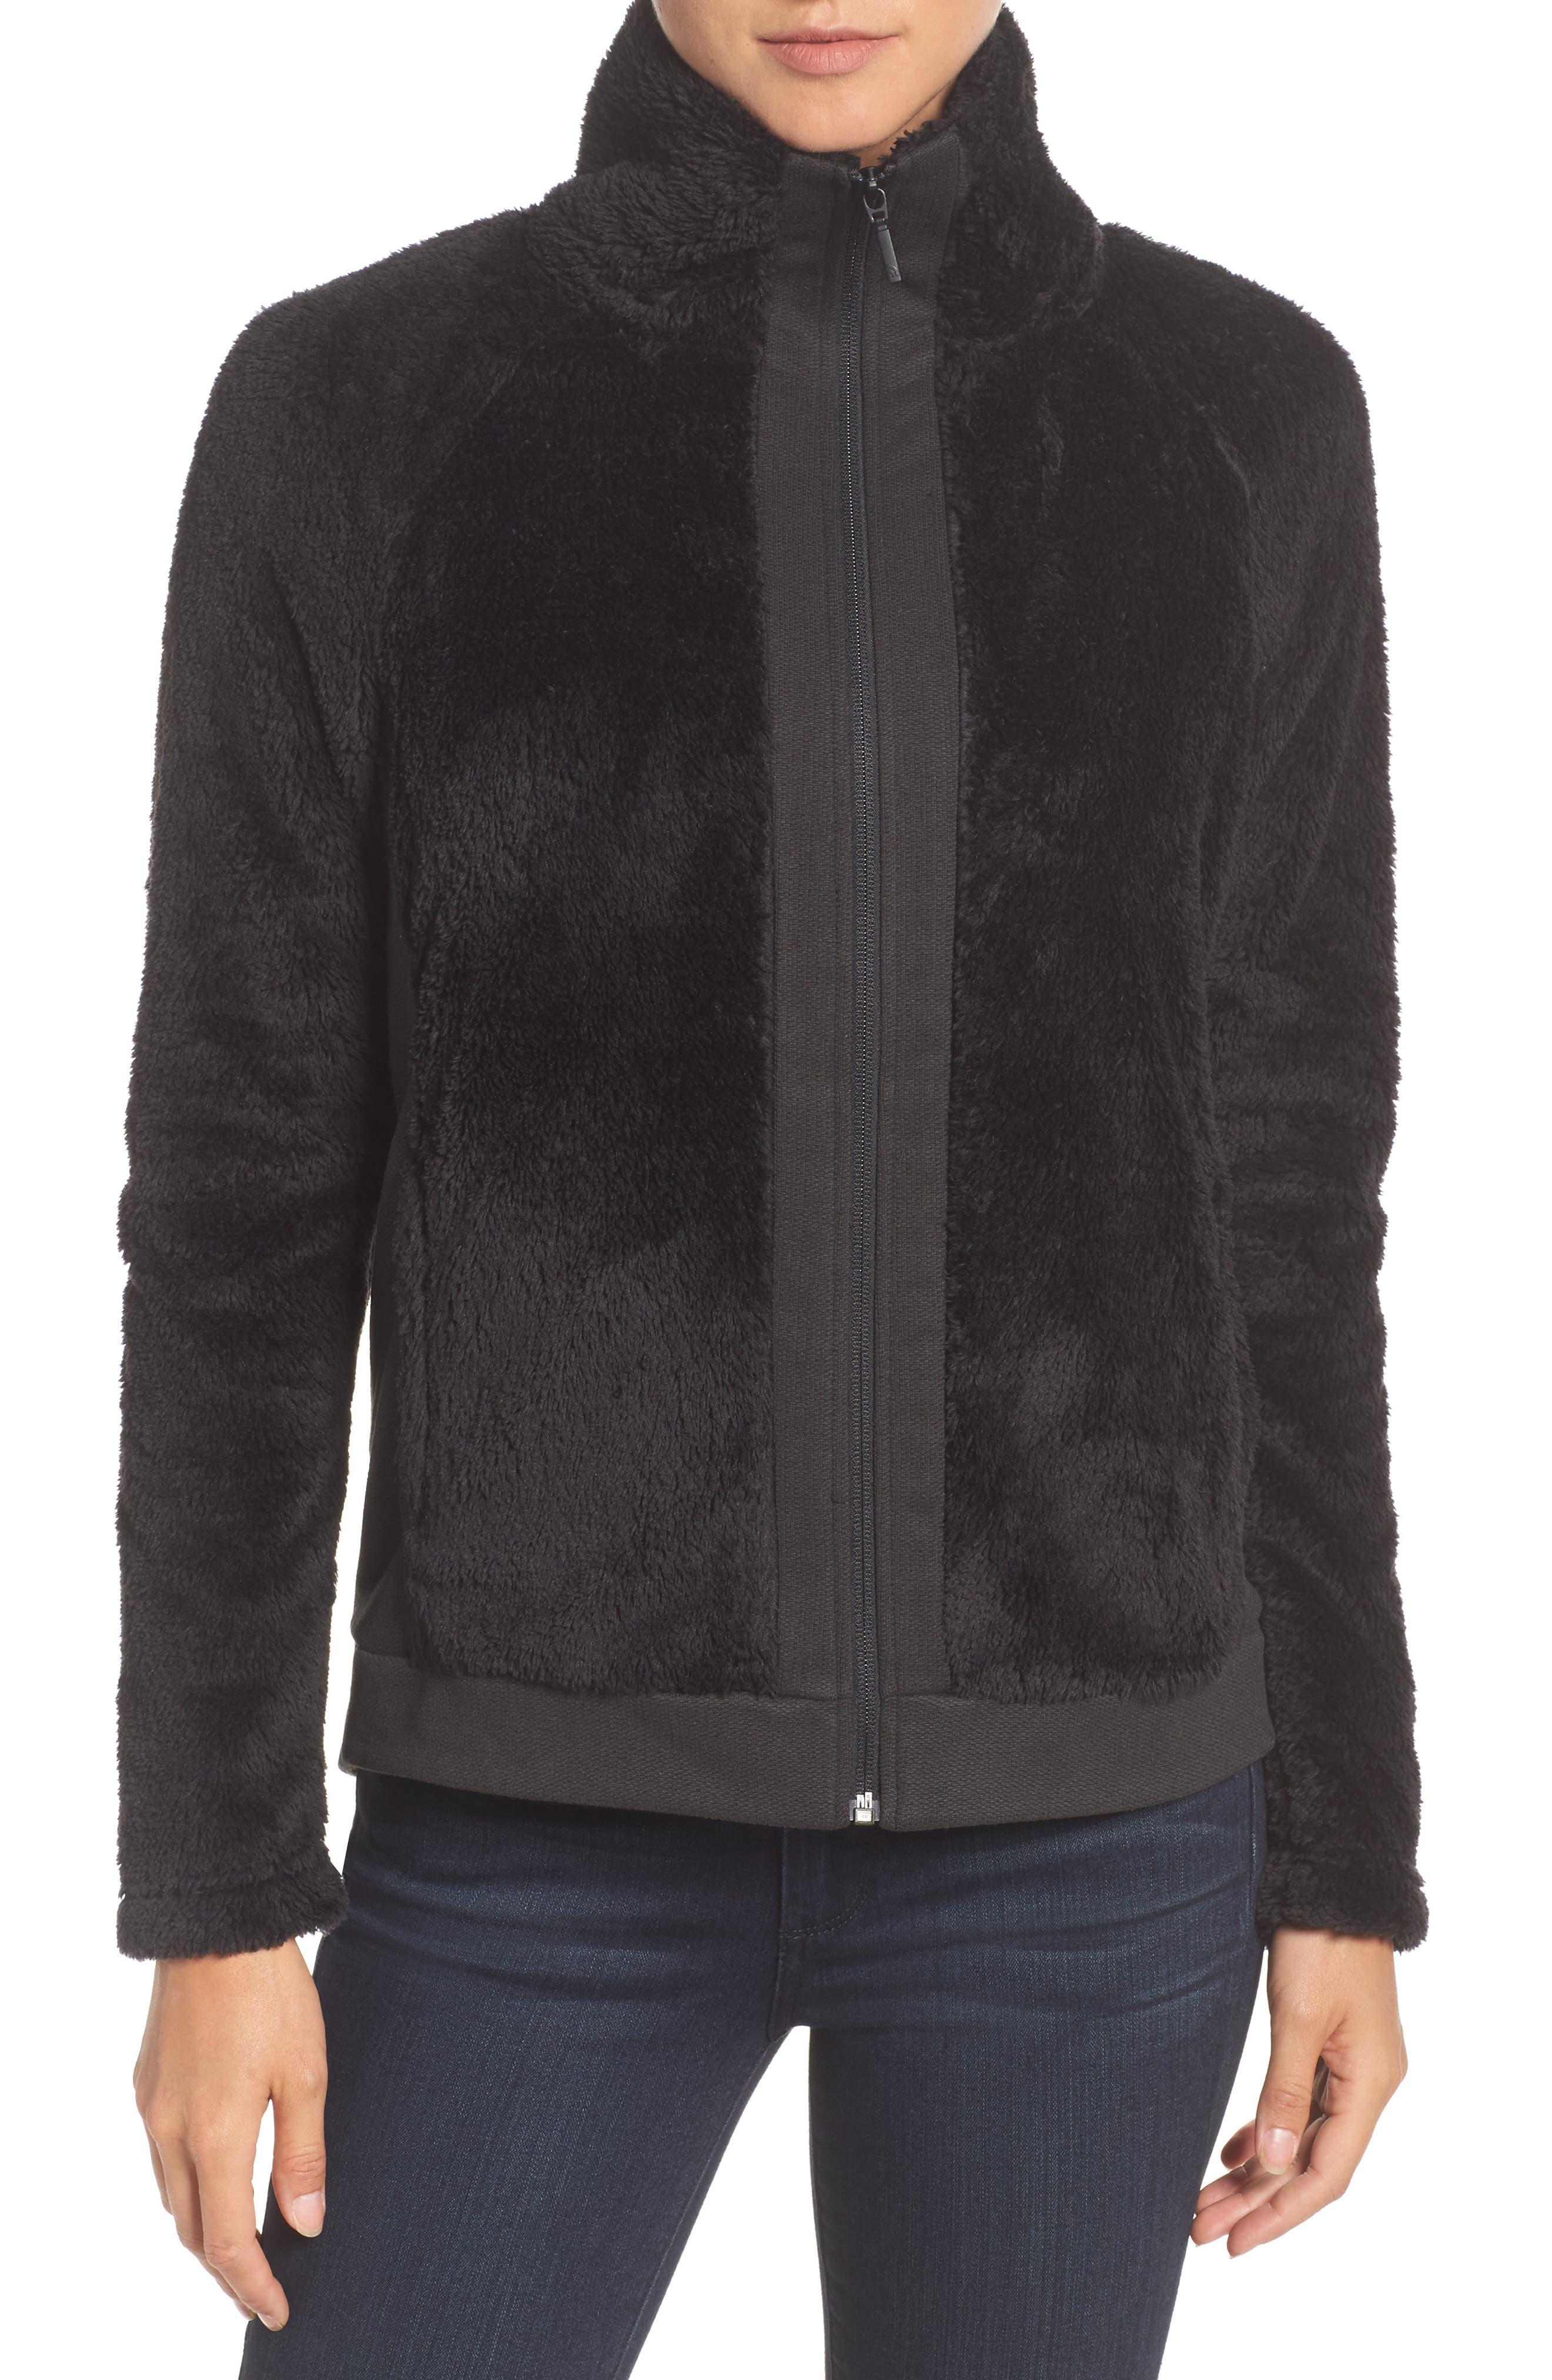 THE NORTH FACE, Furry Fleece Jacket, Main thumbnail 1, color, TNF BLACK